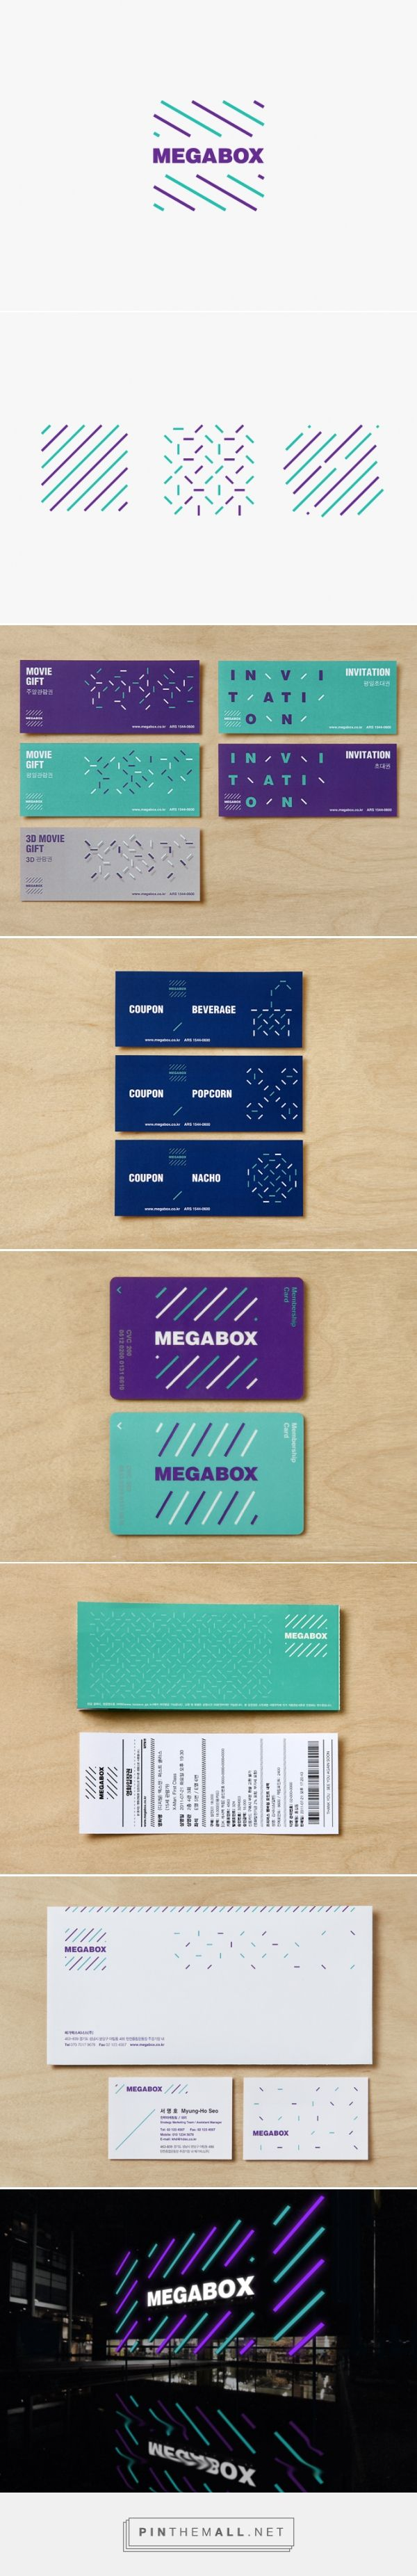 corporate identity for Megabox, a chain of movie theatres - studio fnt... http://www.studiofnt.com/corporate-identity-for-Megabox-a-chain-of-movie-theatres